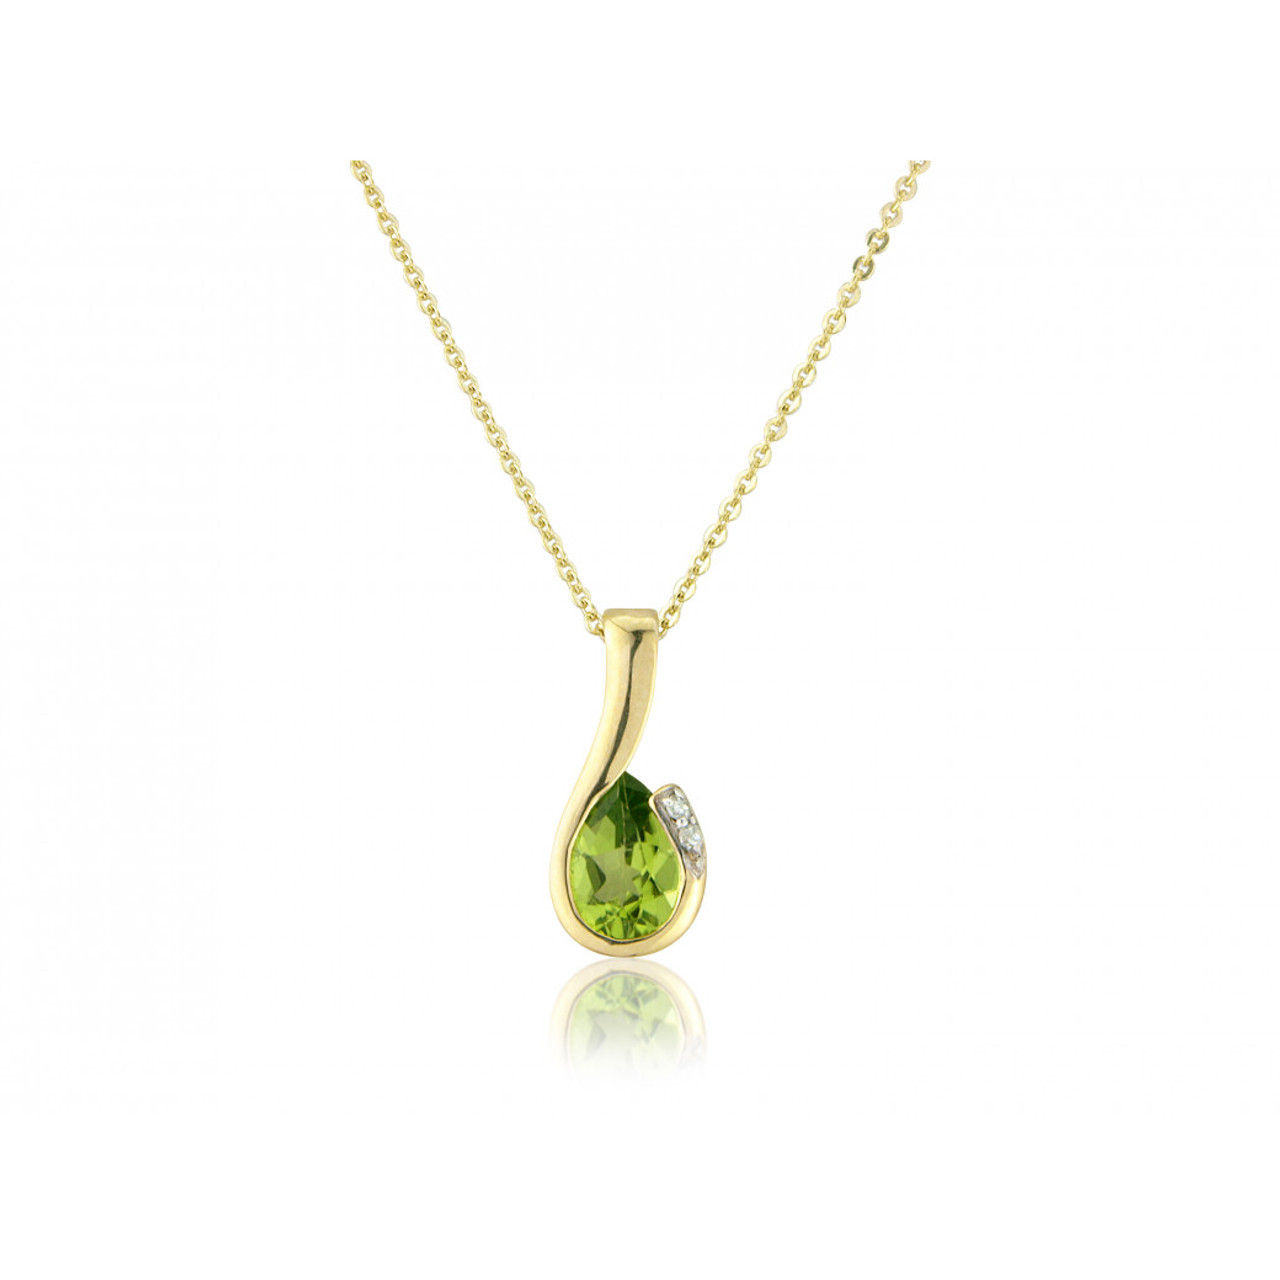 9ct Yellow Gold Peridot & Diamond Curl Pendant Necklace